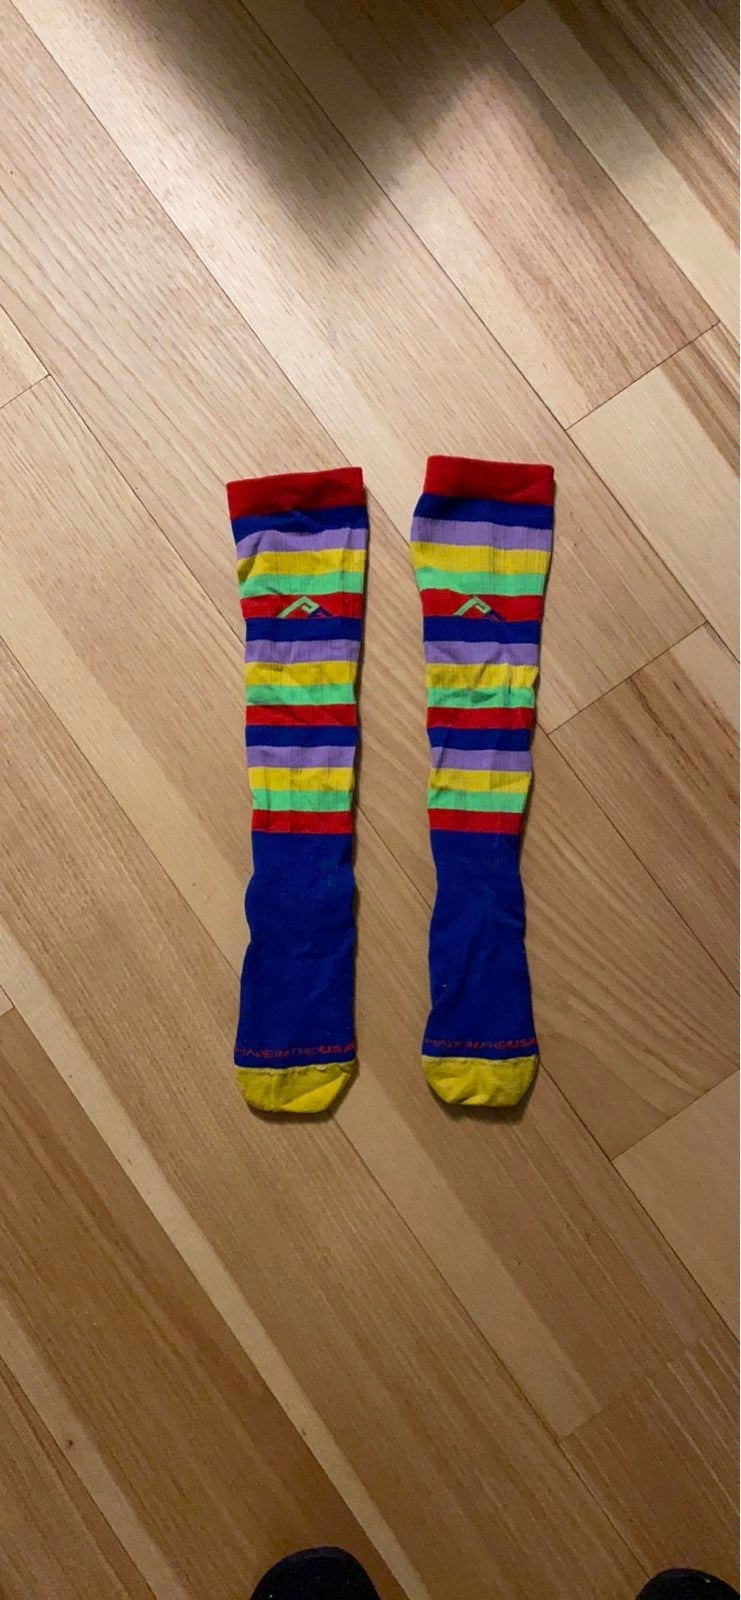 "Pro Compression Socks - ""The Gibblers"""